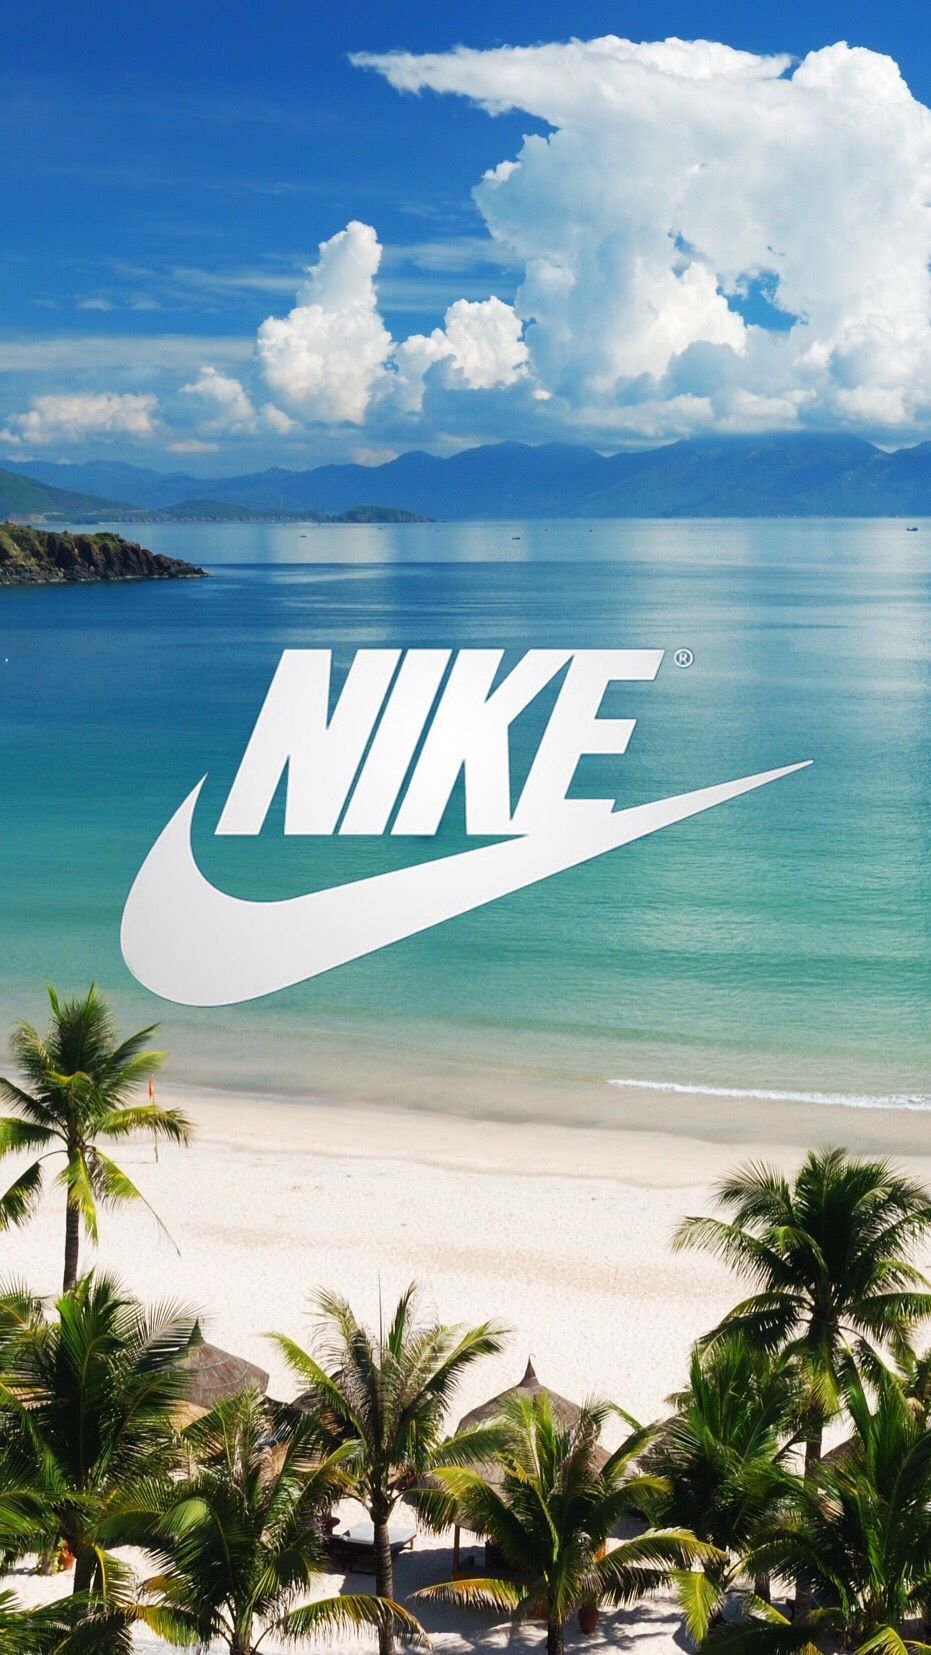 Permalink to Nike Wallpaper Beach